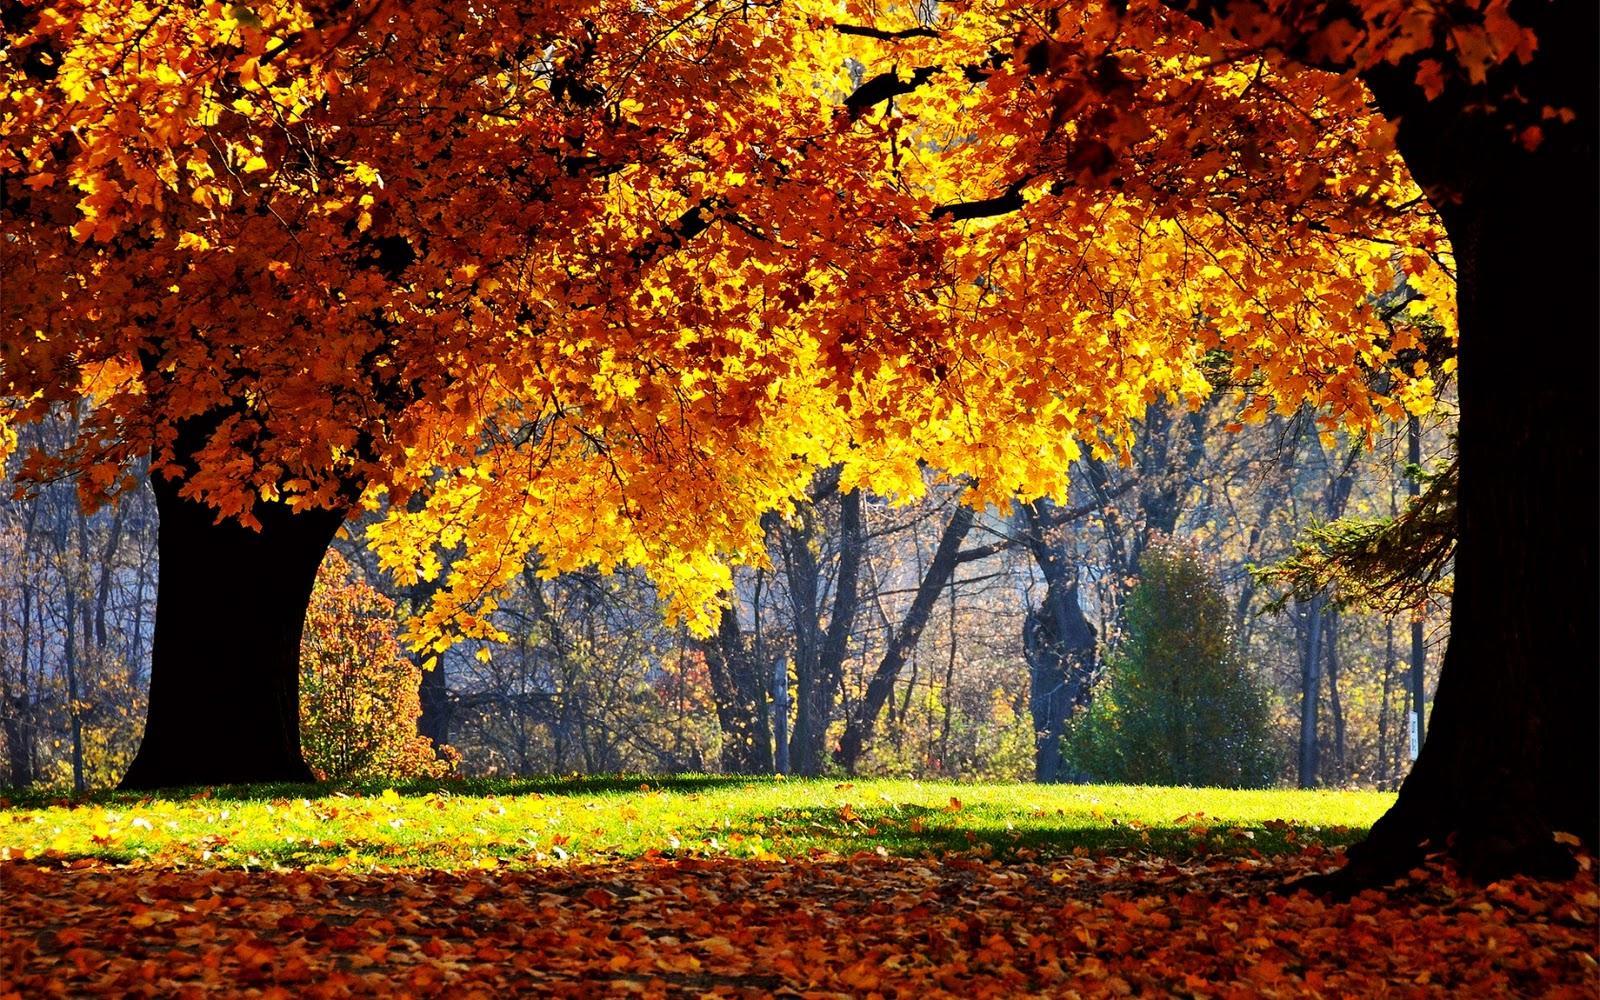 The best top autumn desktop wallpapers 1 En Güzel Sonbahar HD Duvar Kağıtları